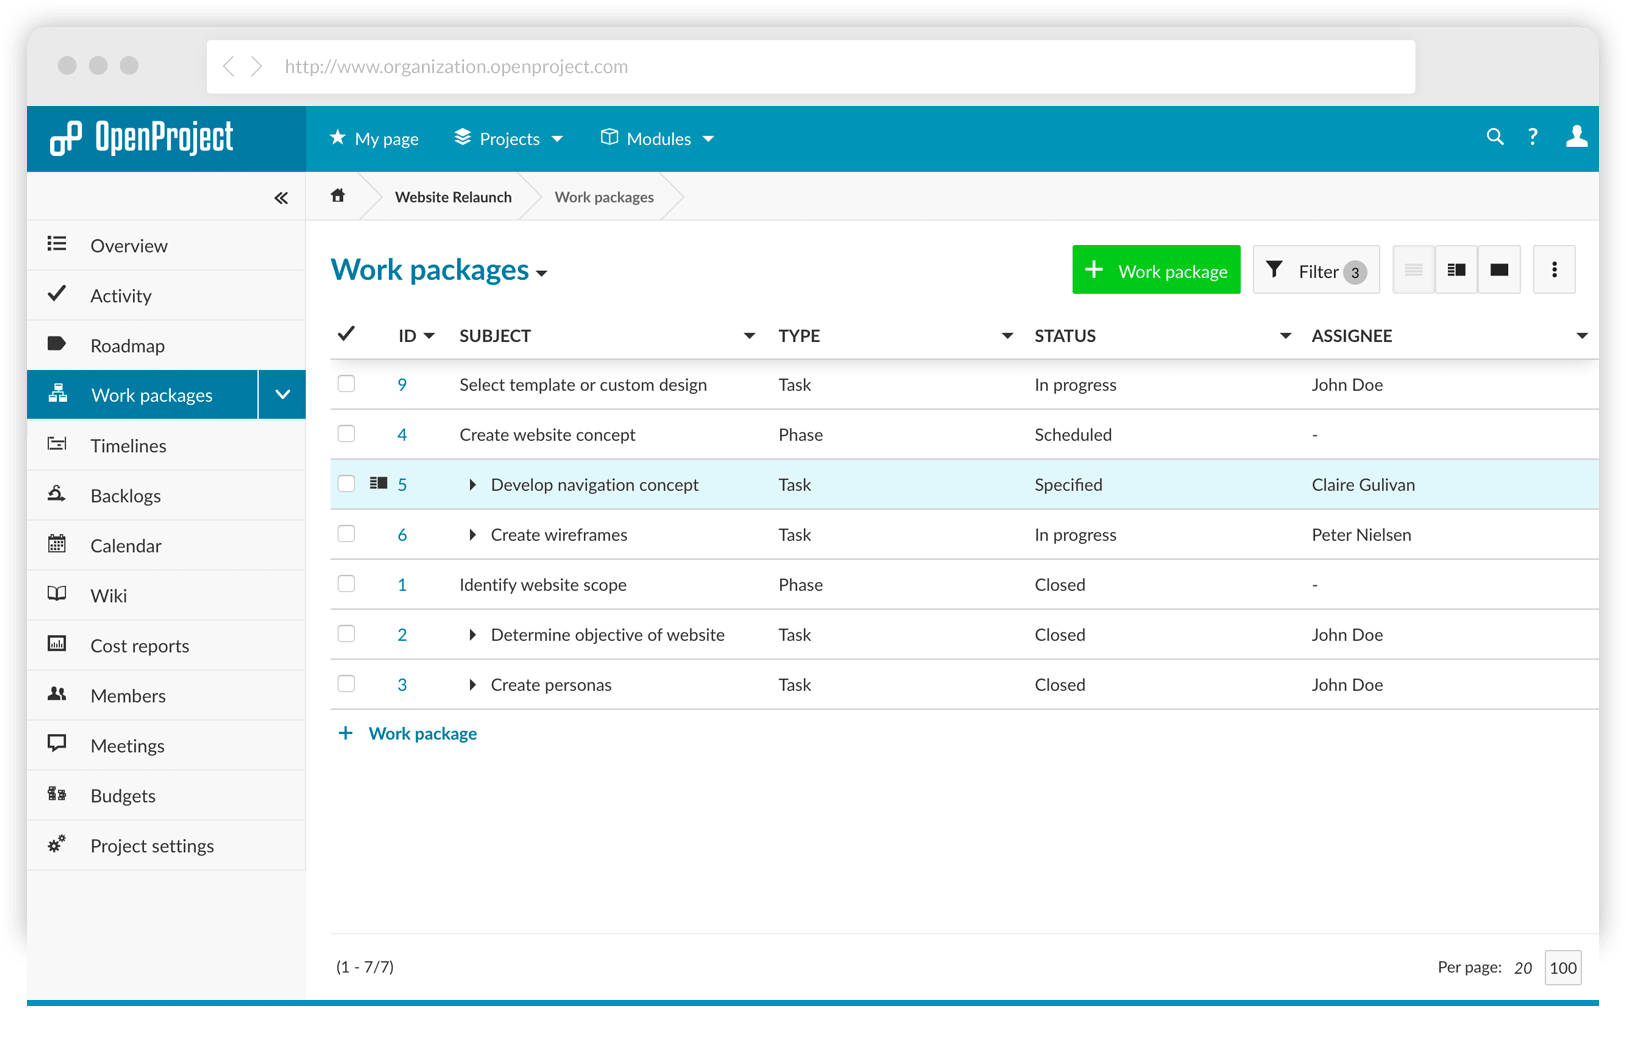 项目管理软件 OpenProject